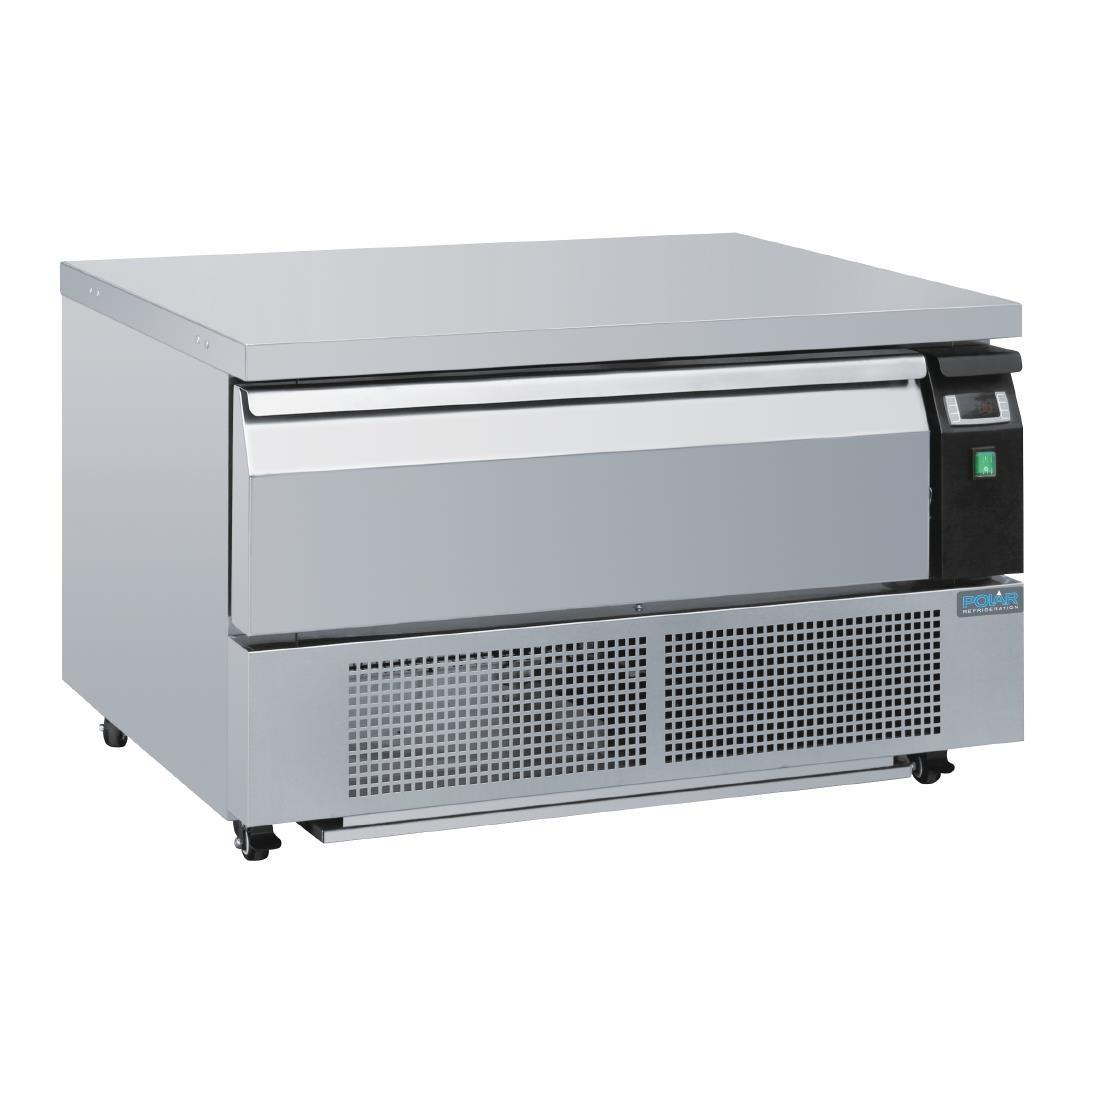 Polar DA994 U-Series Single Drawer Counter Fridge Freezer